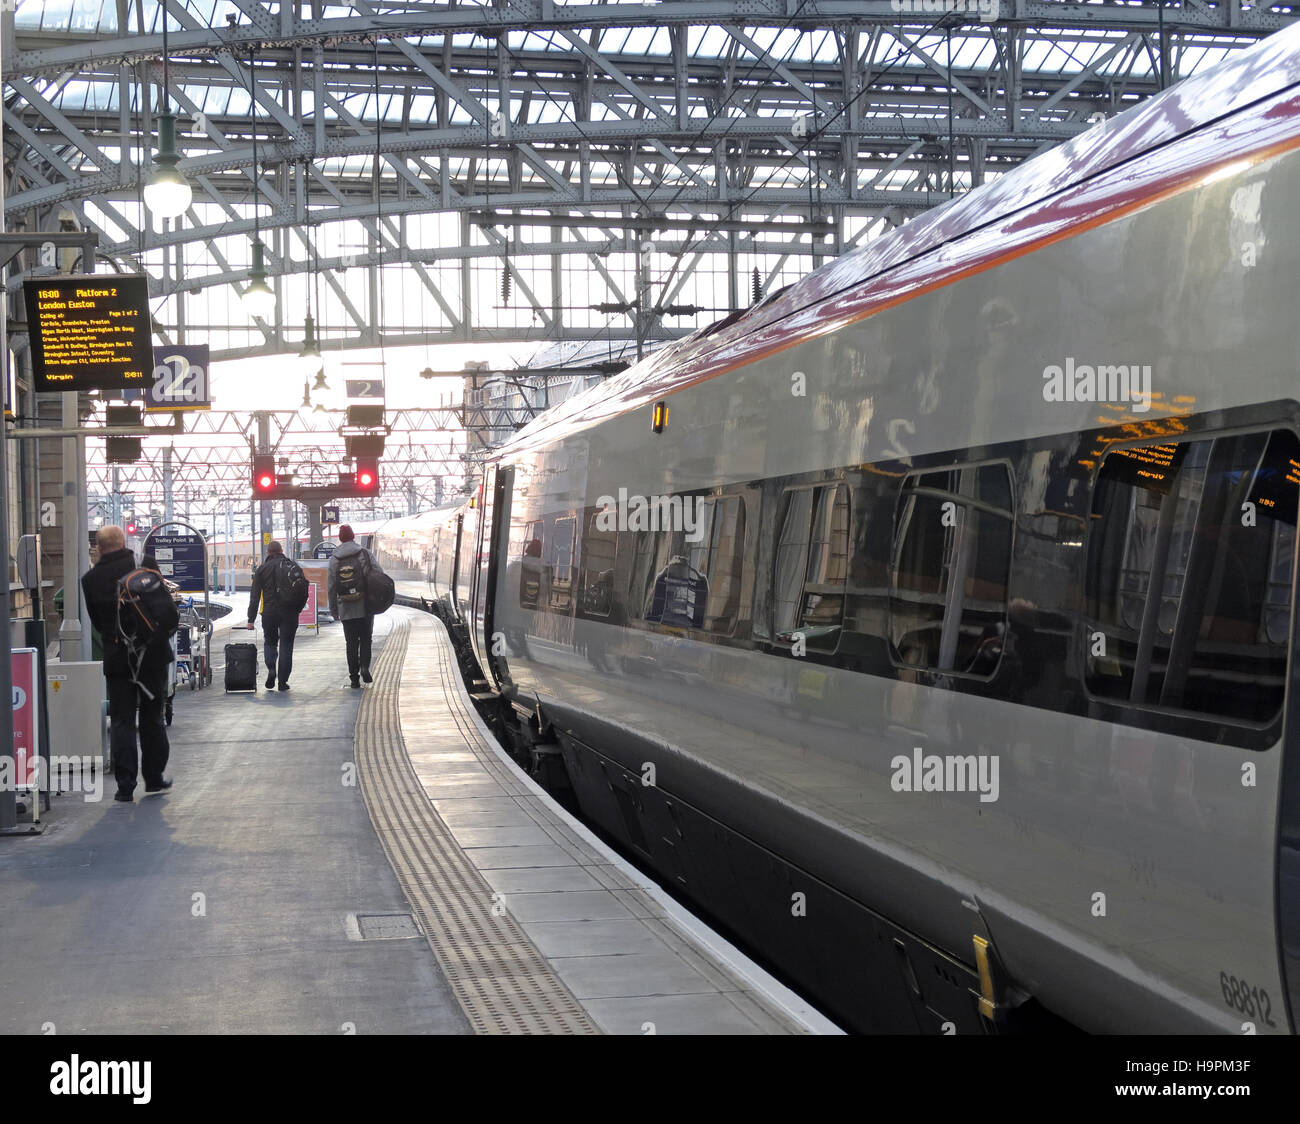 Glasgow Central Station - Passengers boarding Euston West Coast Main Line Train Stock Photo